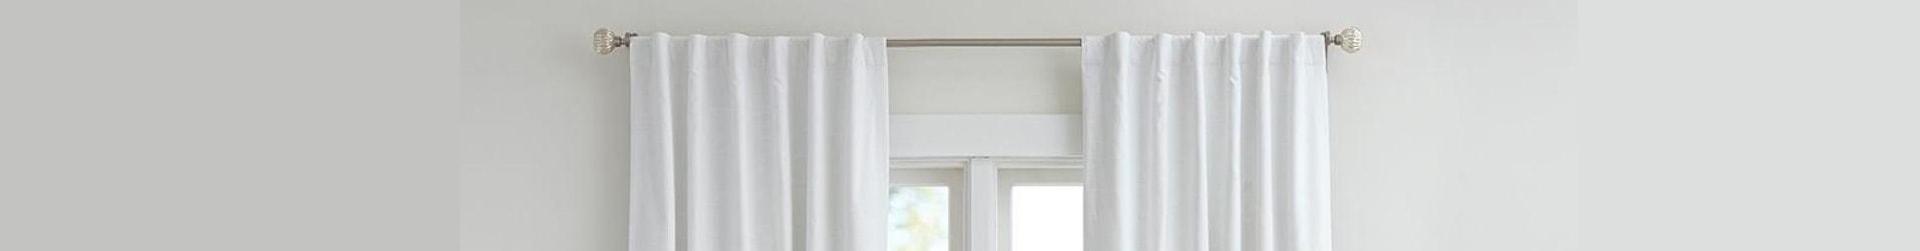 Brass Curtain Rod Finials Decorative Finials Drapery